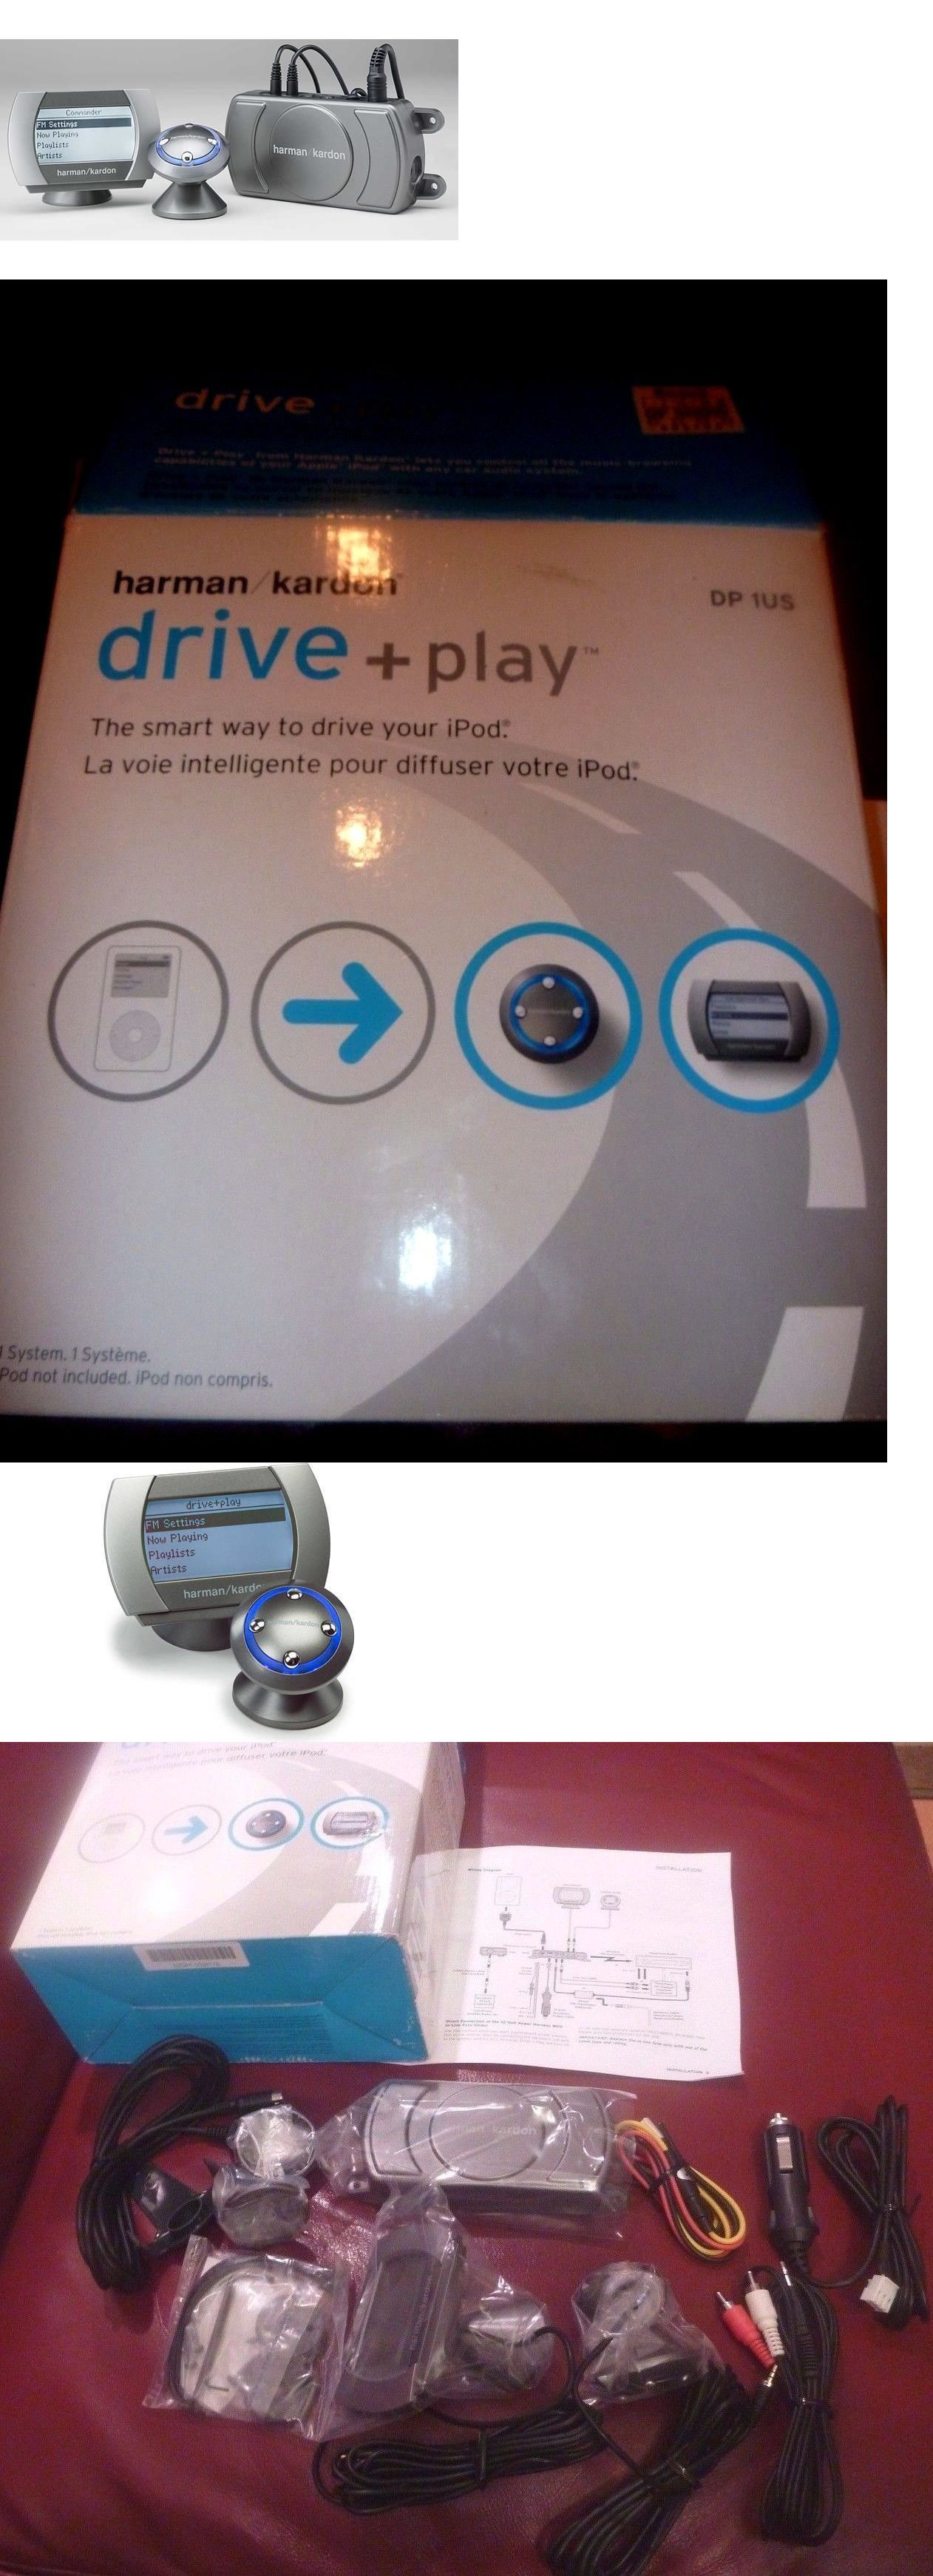 harman kardon drive and play. audio video remotes: control ipod vehicle harman kardon drive+play dp 1us new drive and play